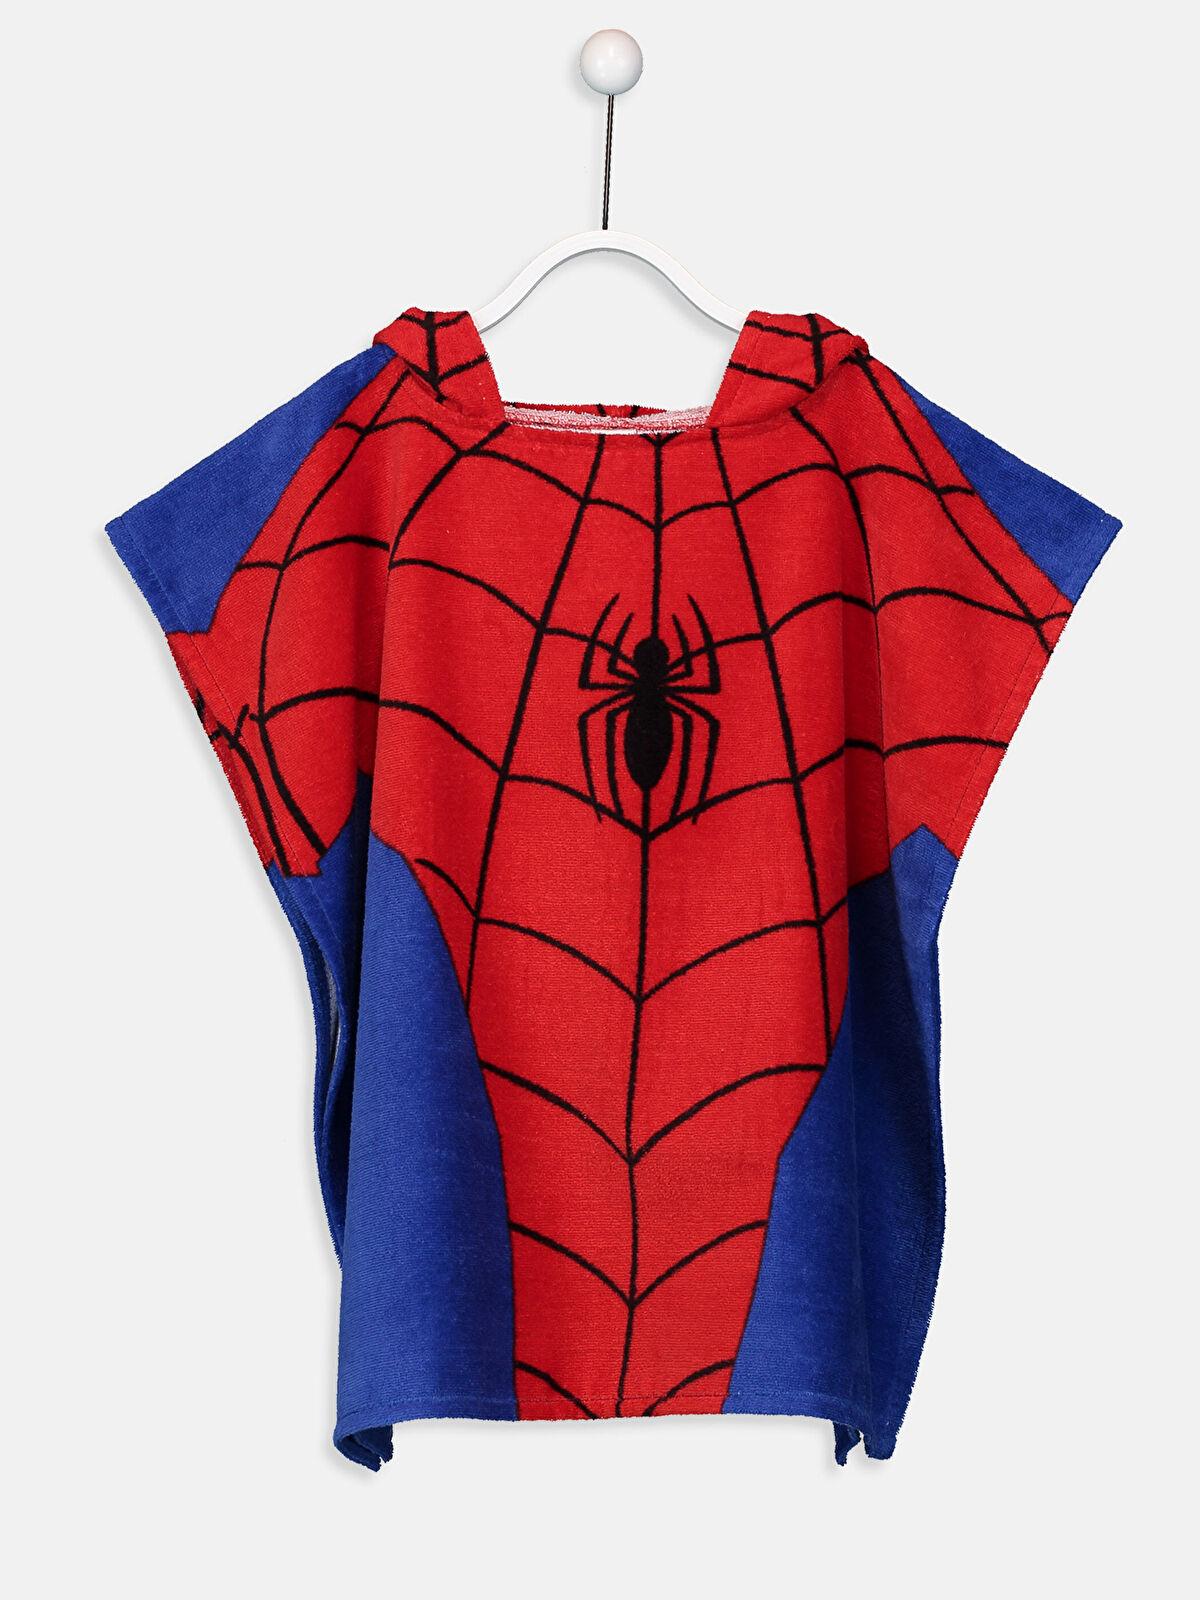 Spiderman Kapüşonlu Panço - LCW HOME